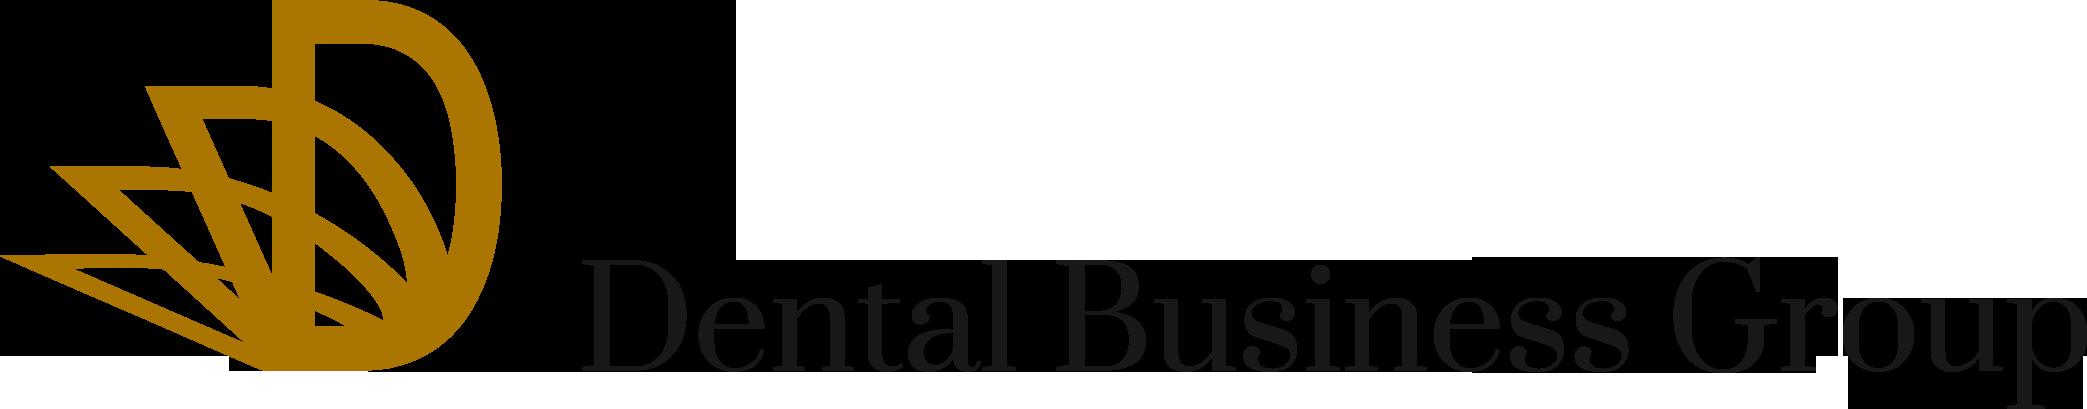 Dental Business Group